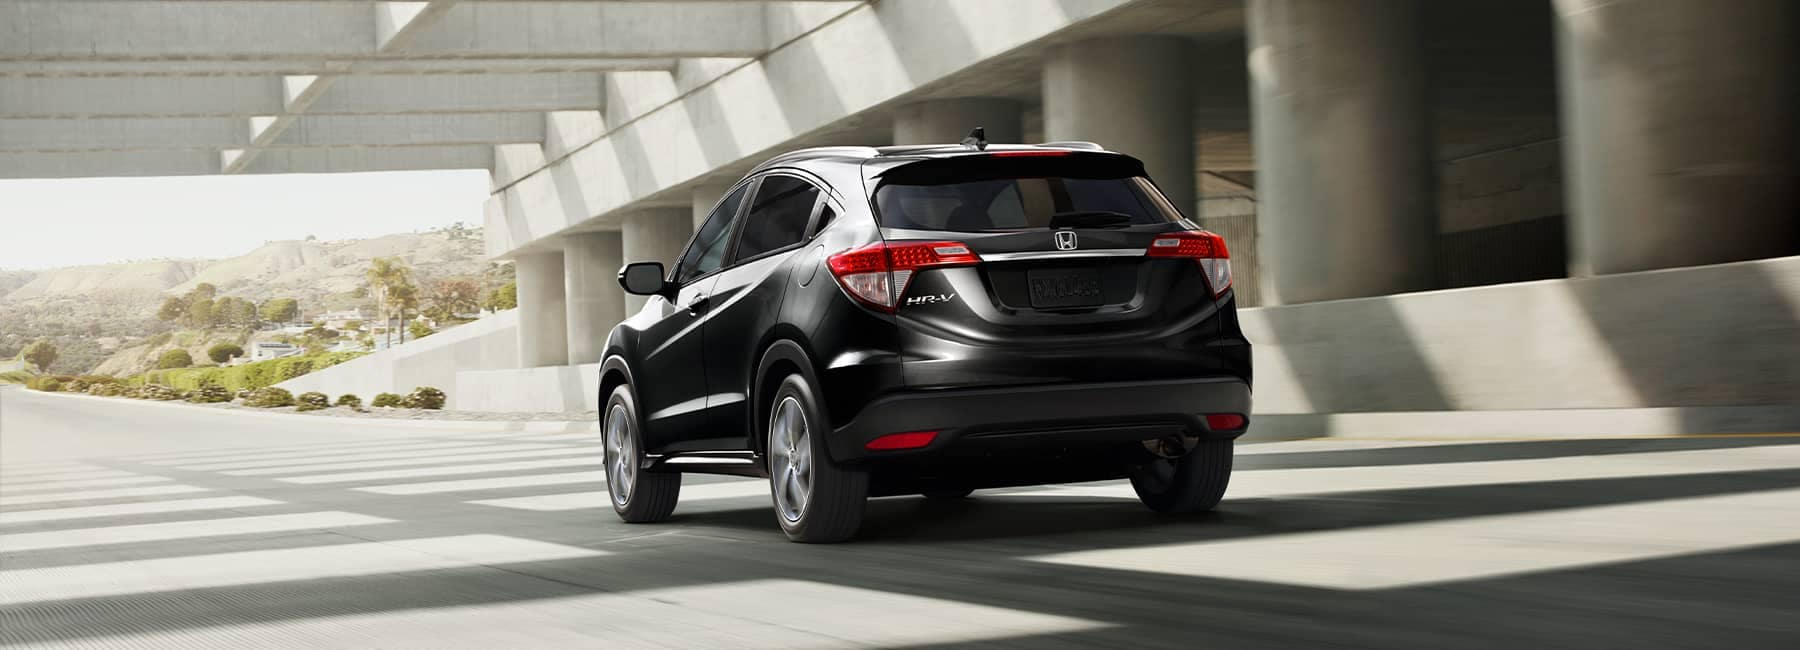 back angle of a 2021 black Honda Accord driving up a city road